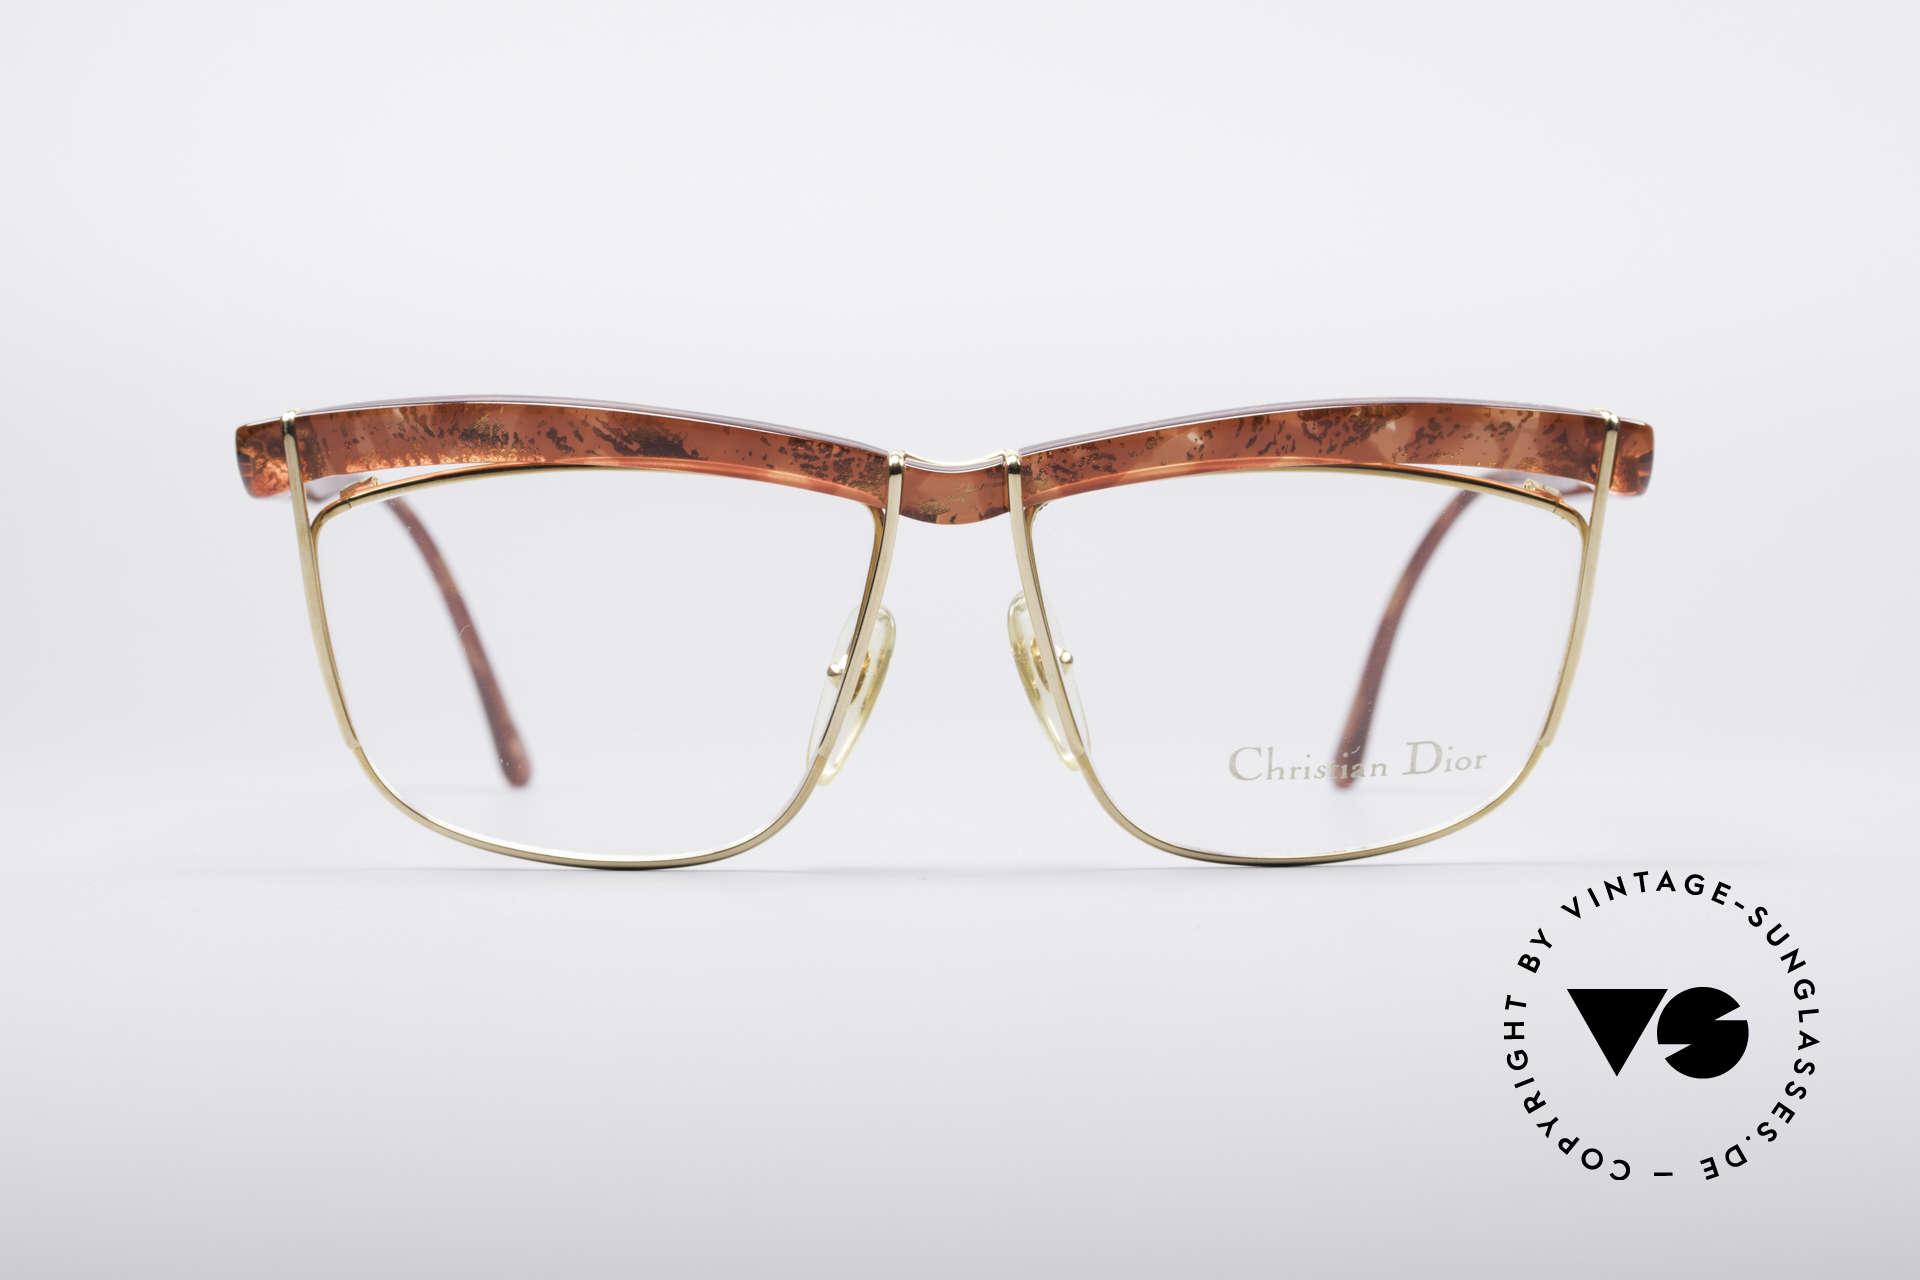 31c6ad4e91 Glasses christian dior designer frame vintage sunglasses jpg 1920x1280 90s glasses  frames